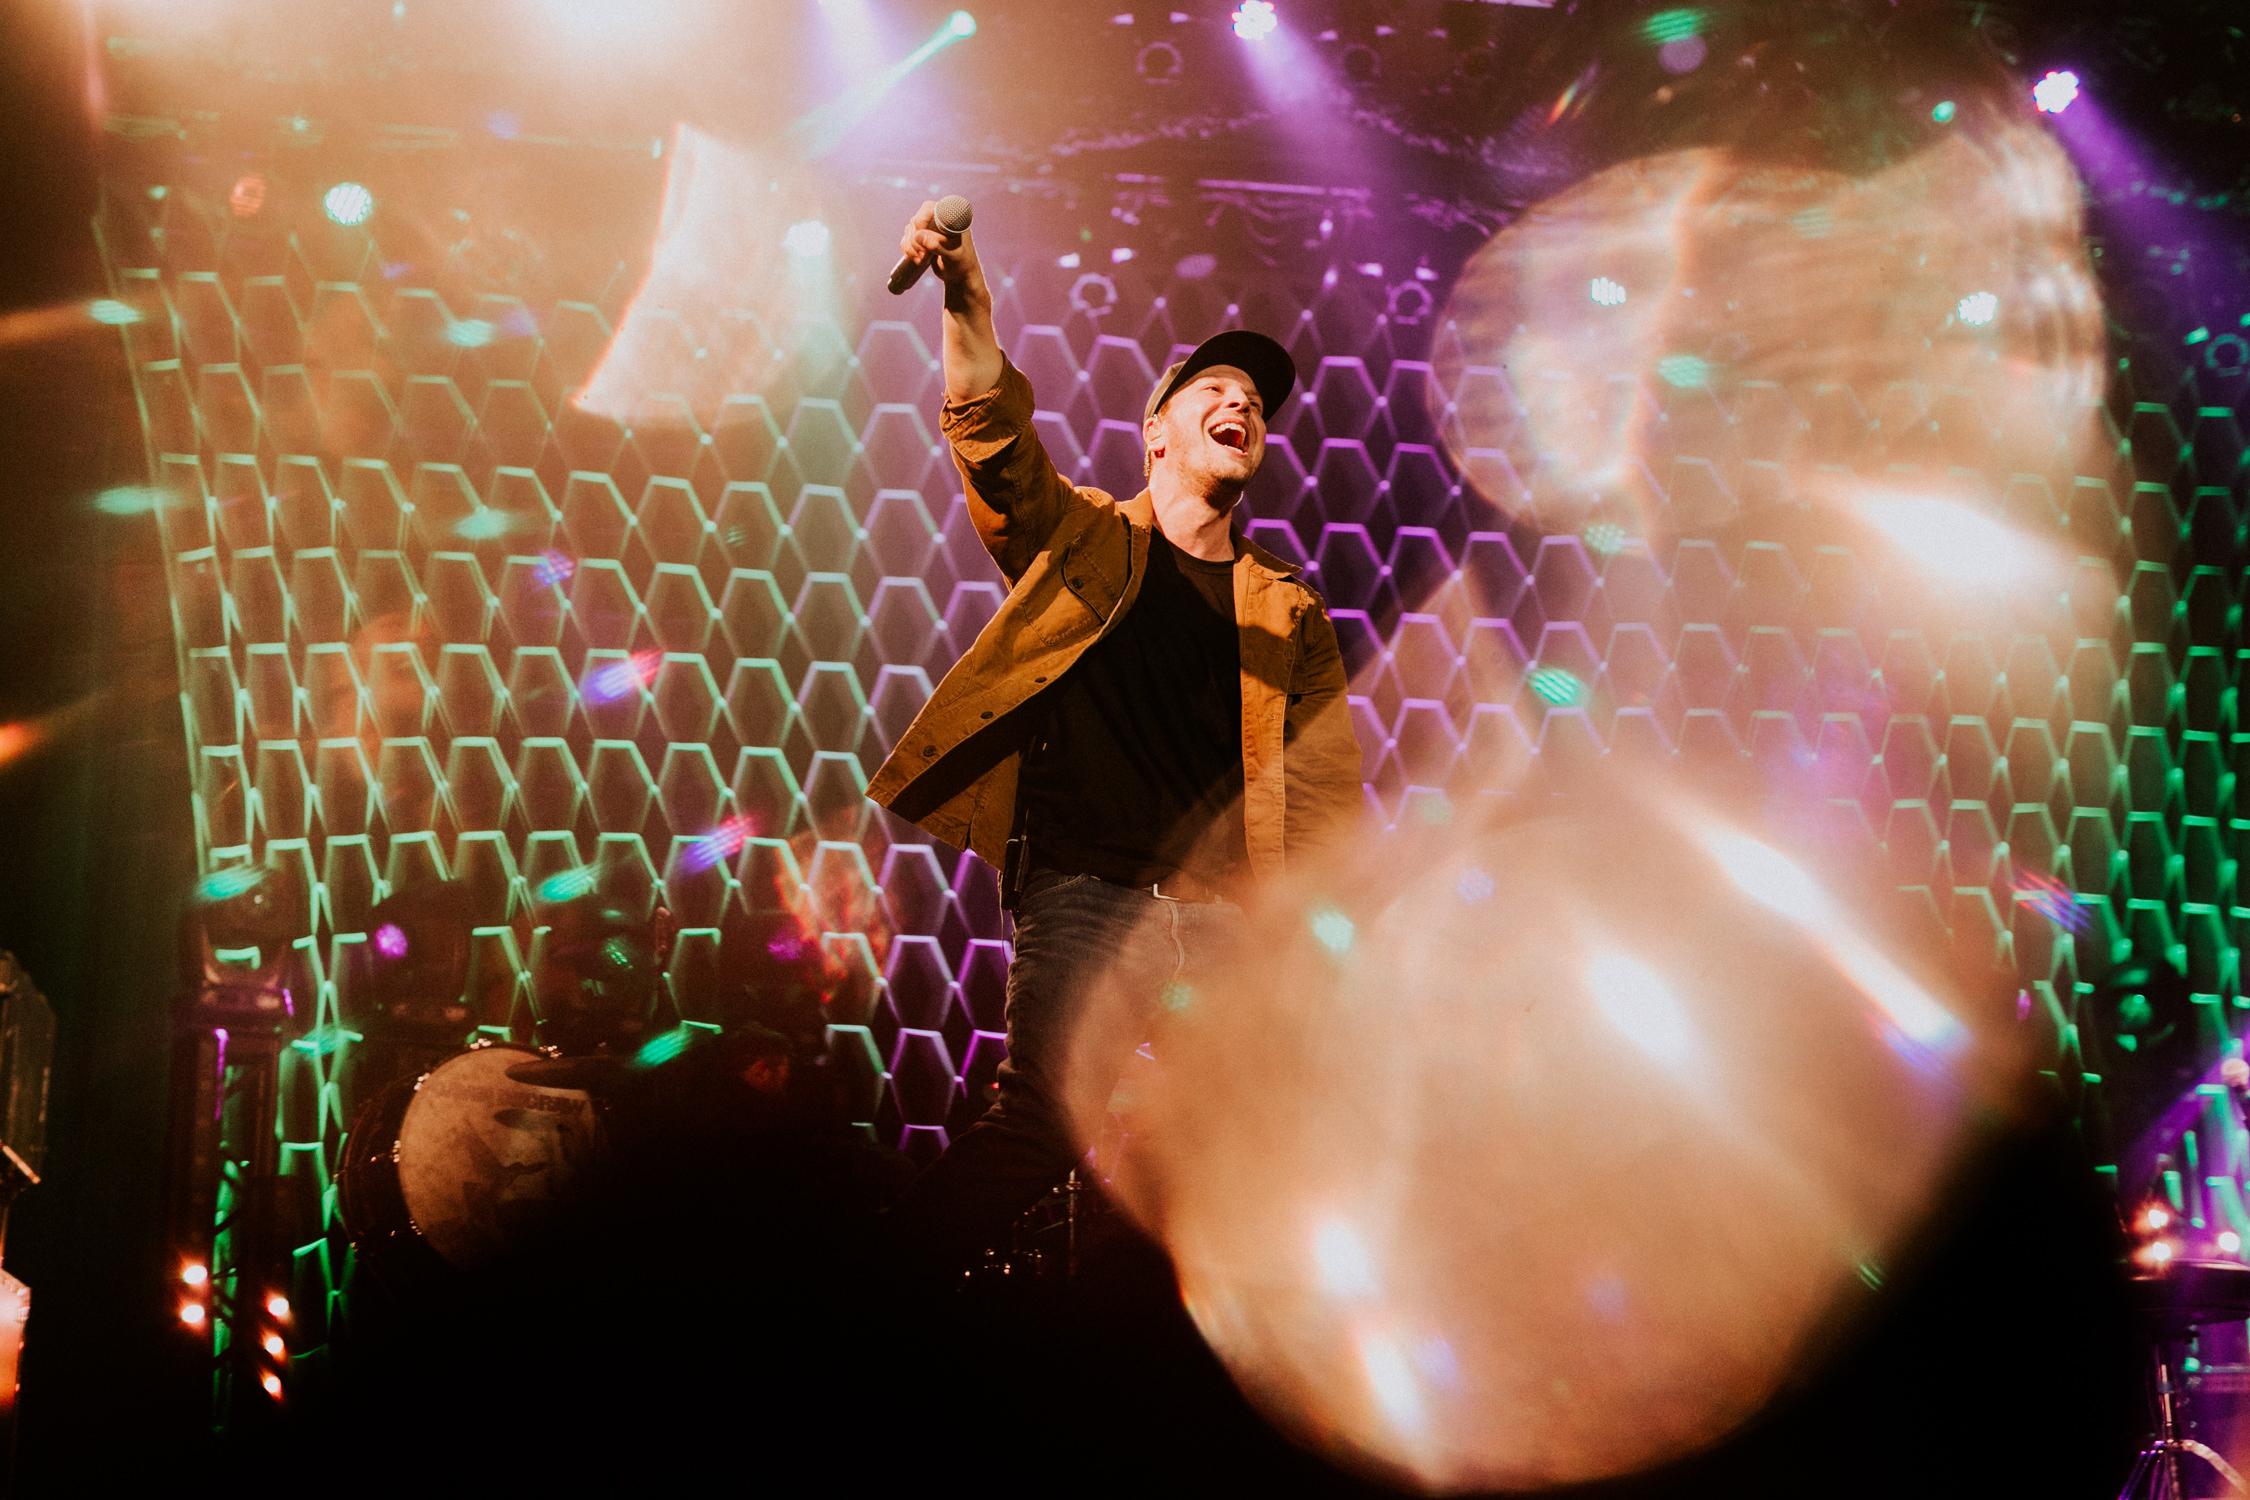 gavin-degraw-prism-light-flare-concert-AnnaLeeMedia